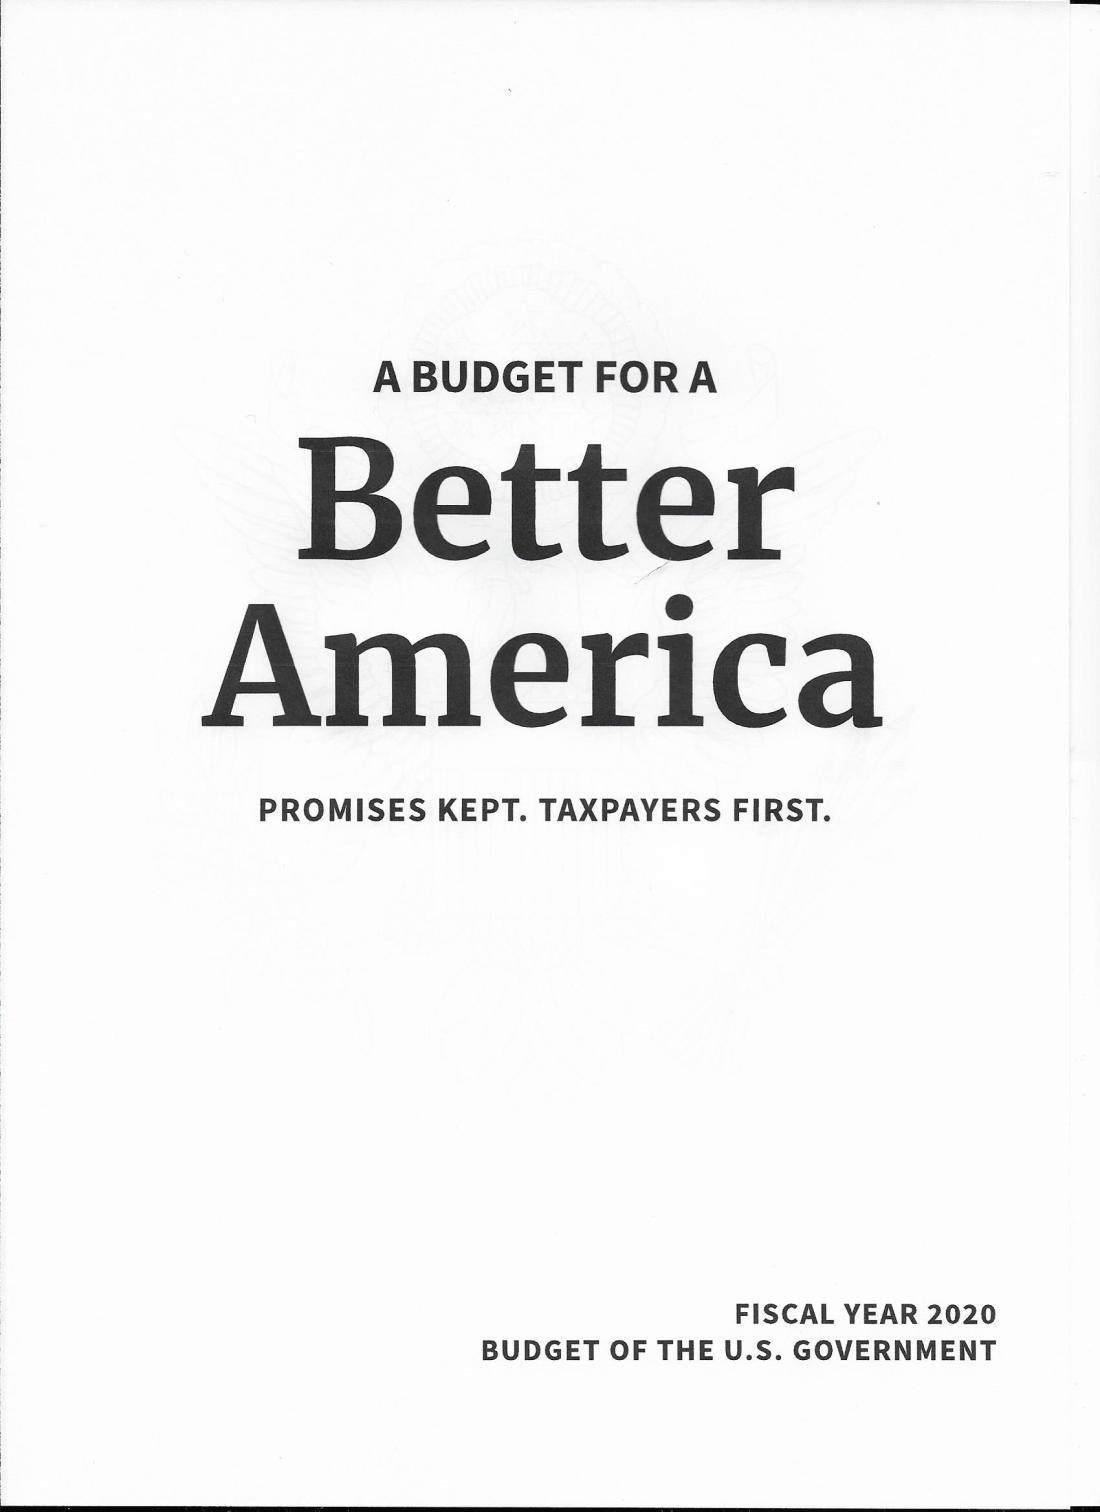 Trump Budget 2020